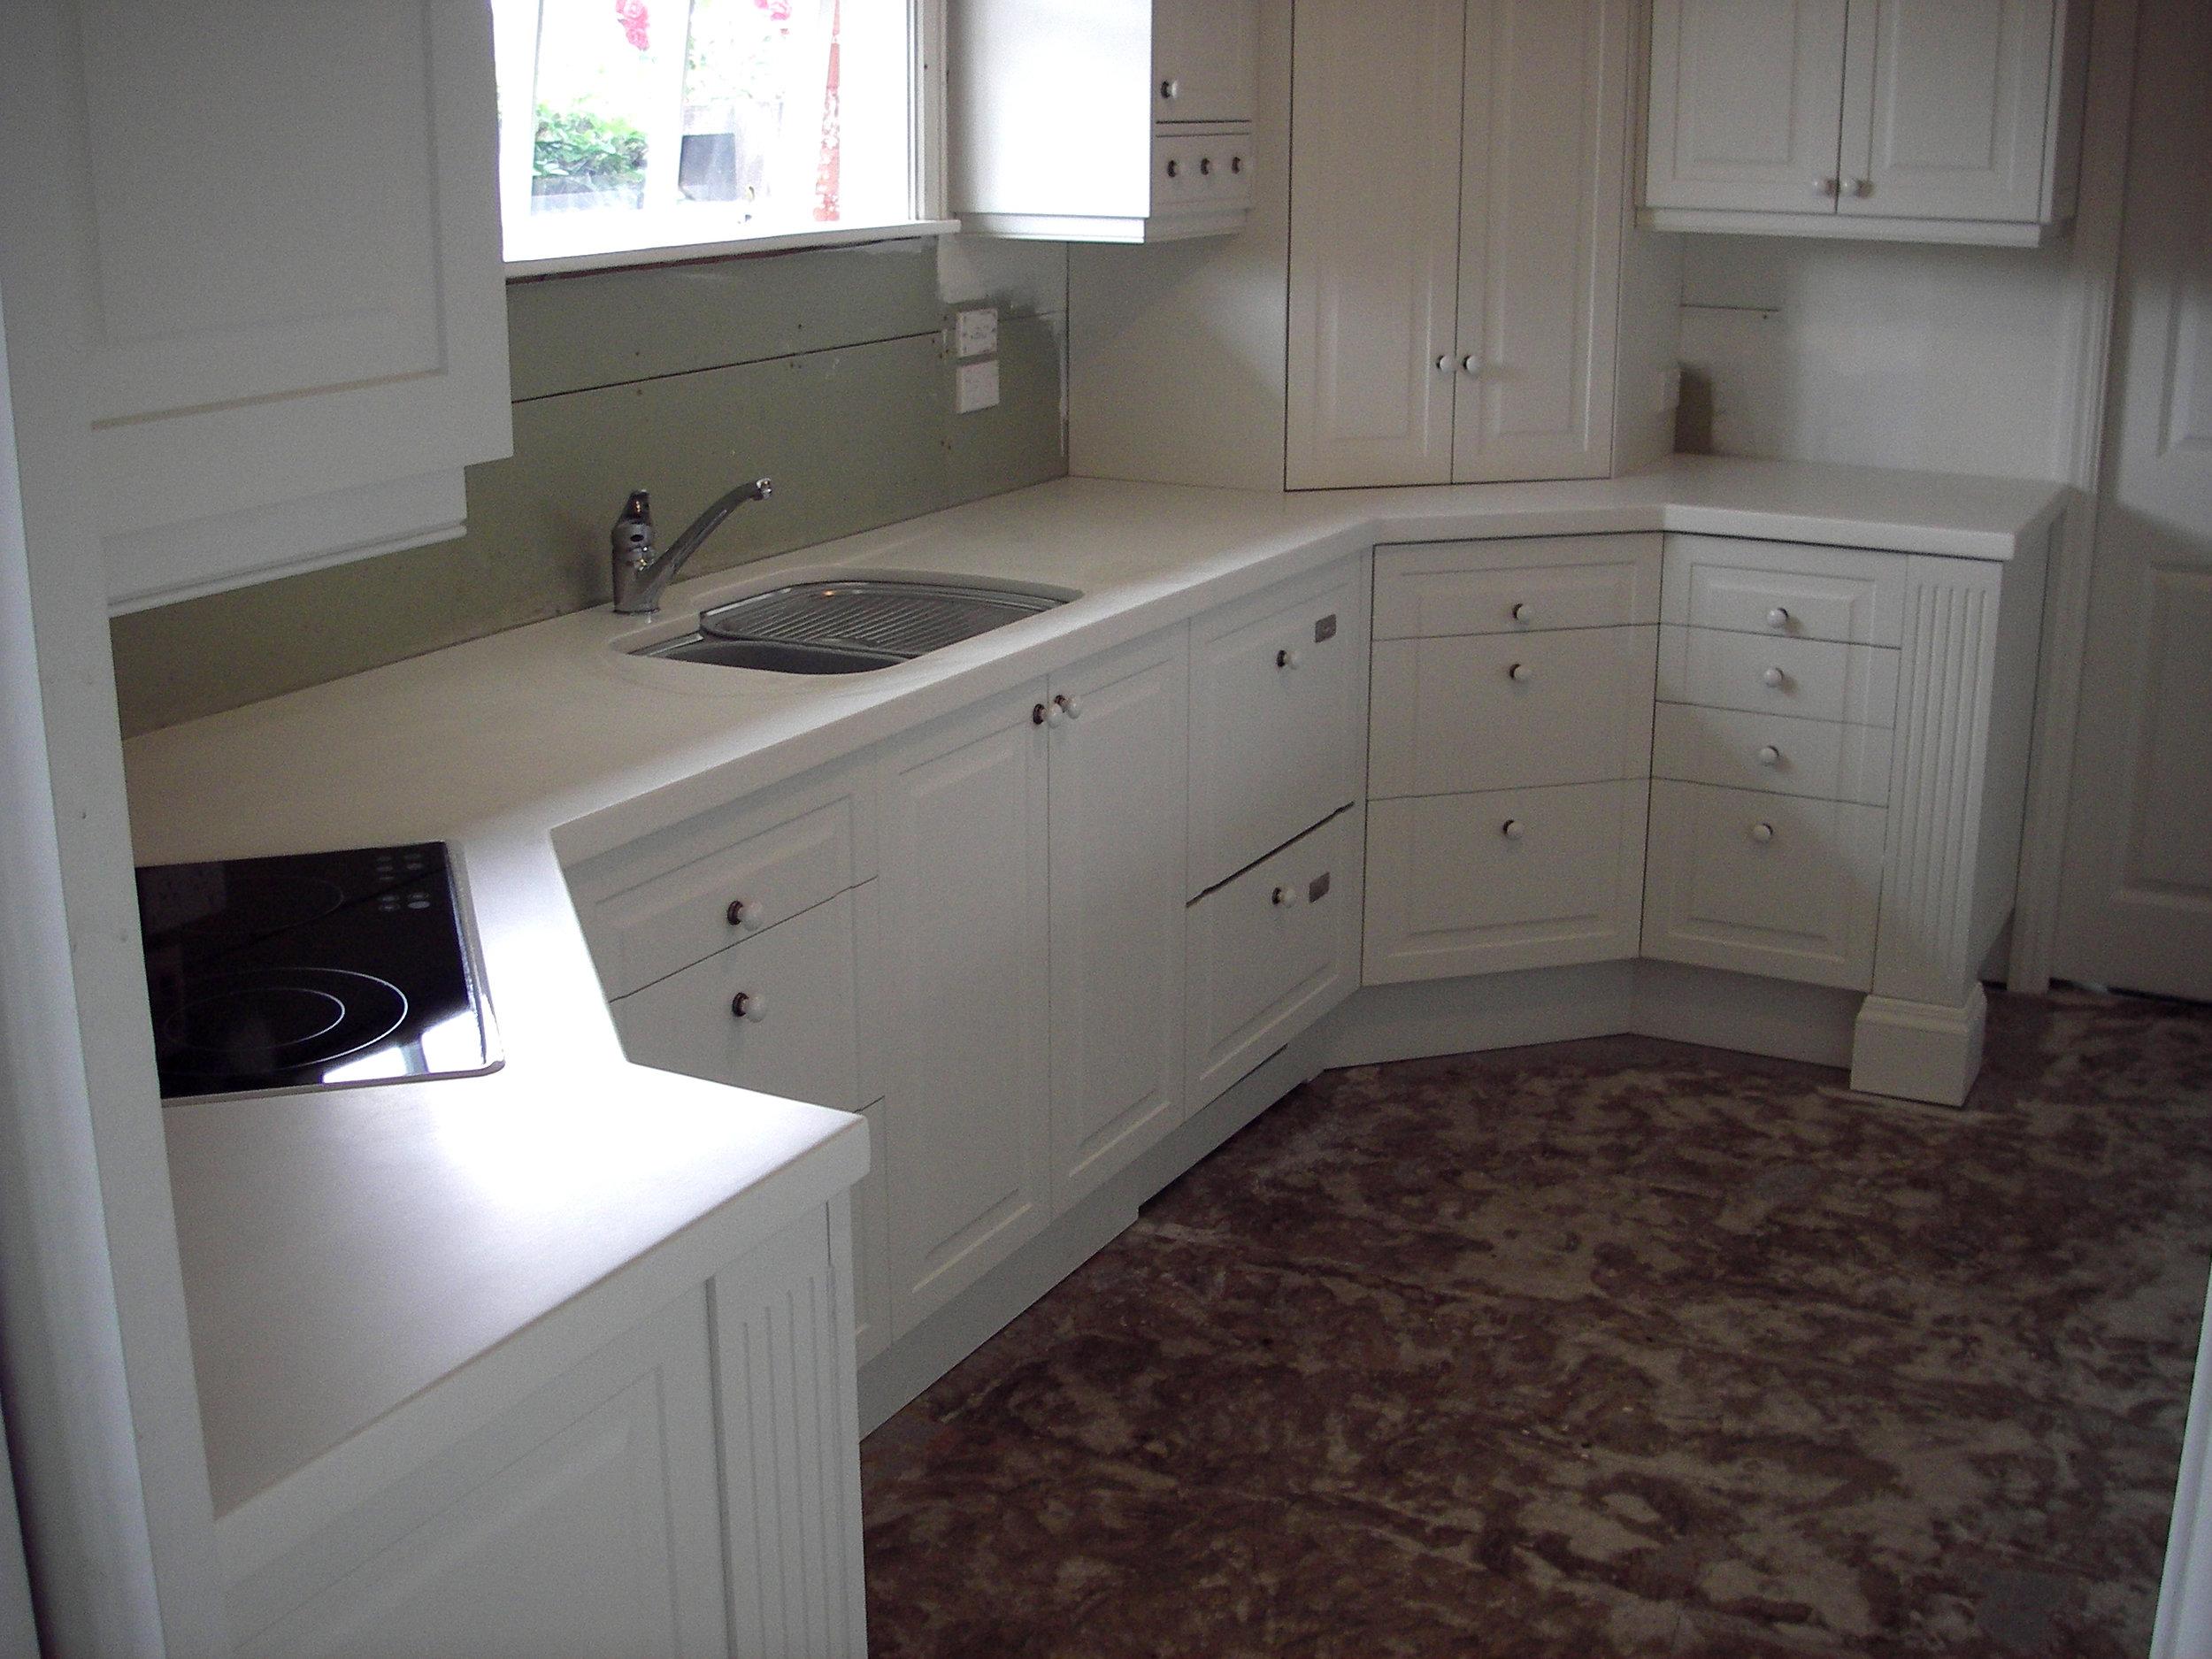 Leonard kitchen 1.jpg